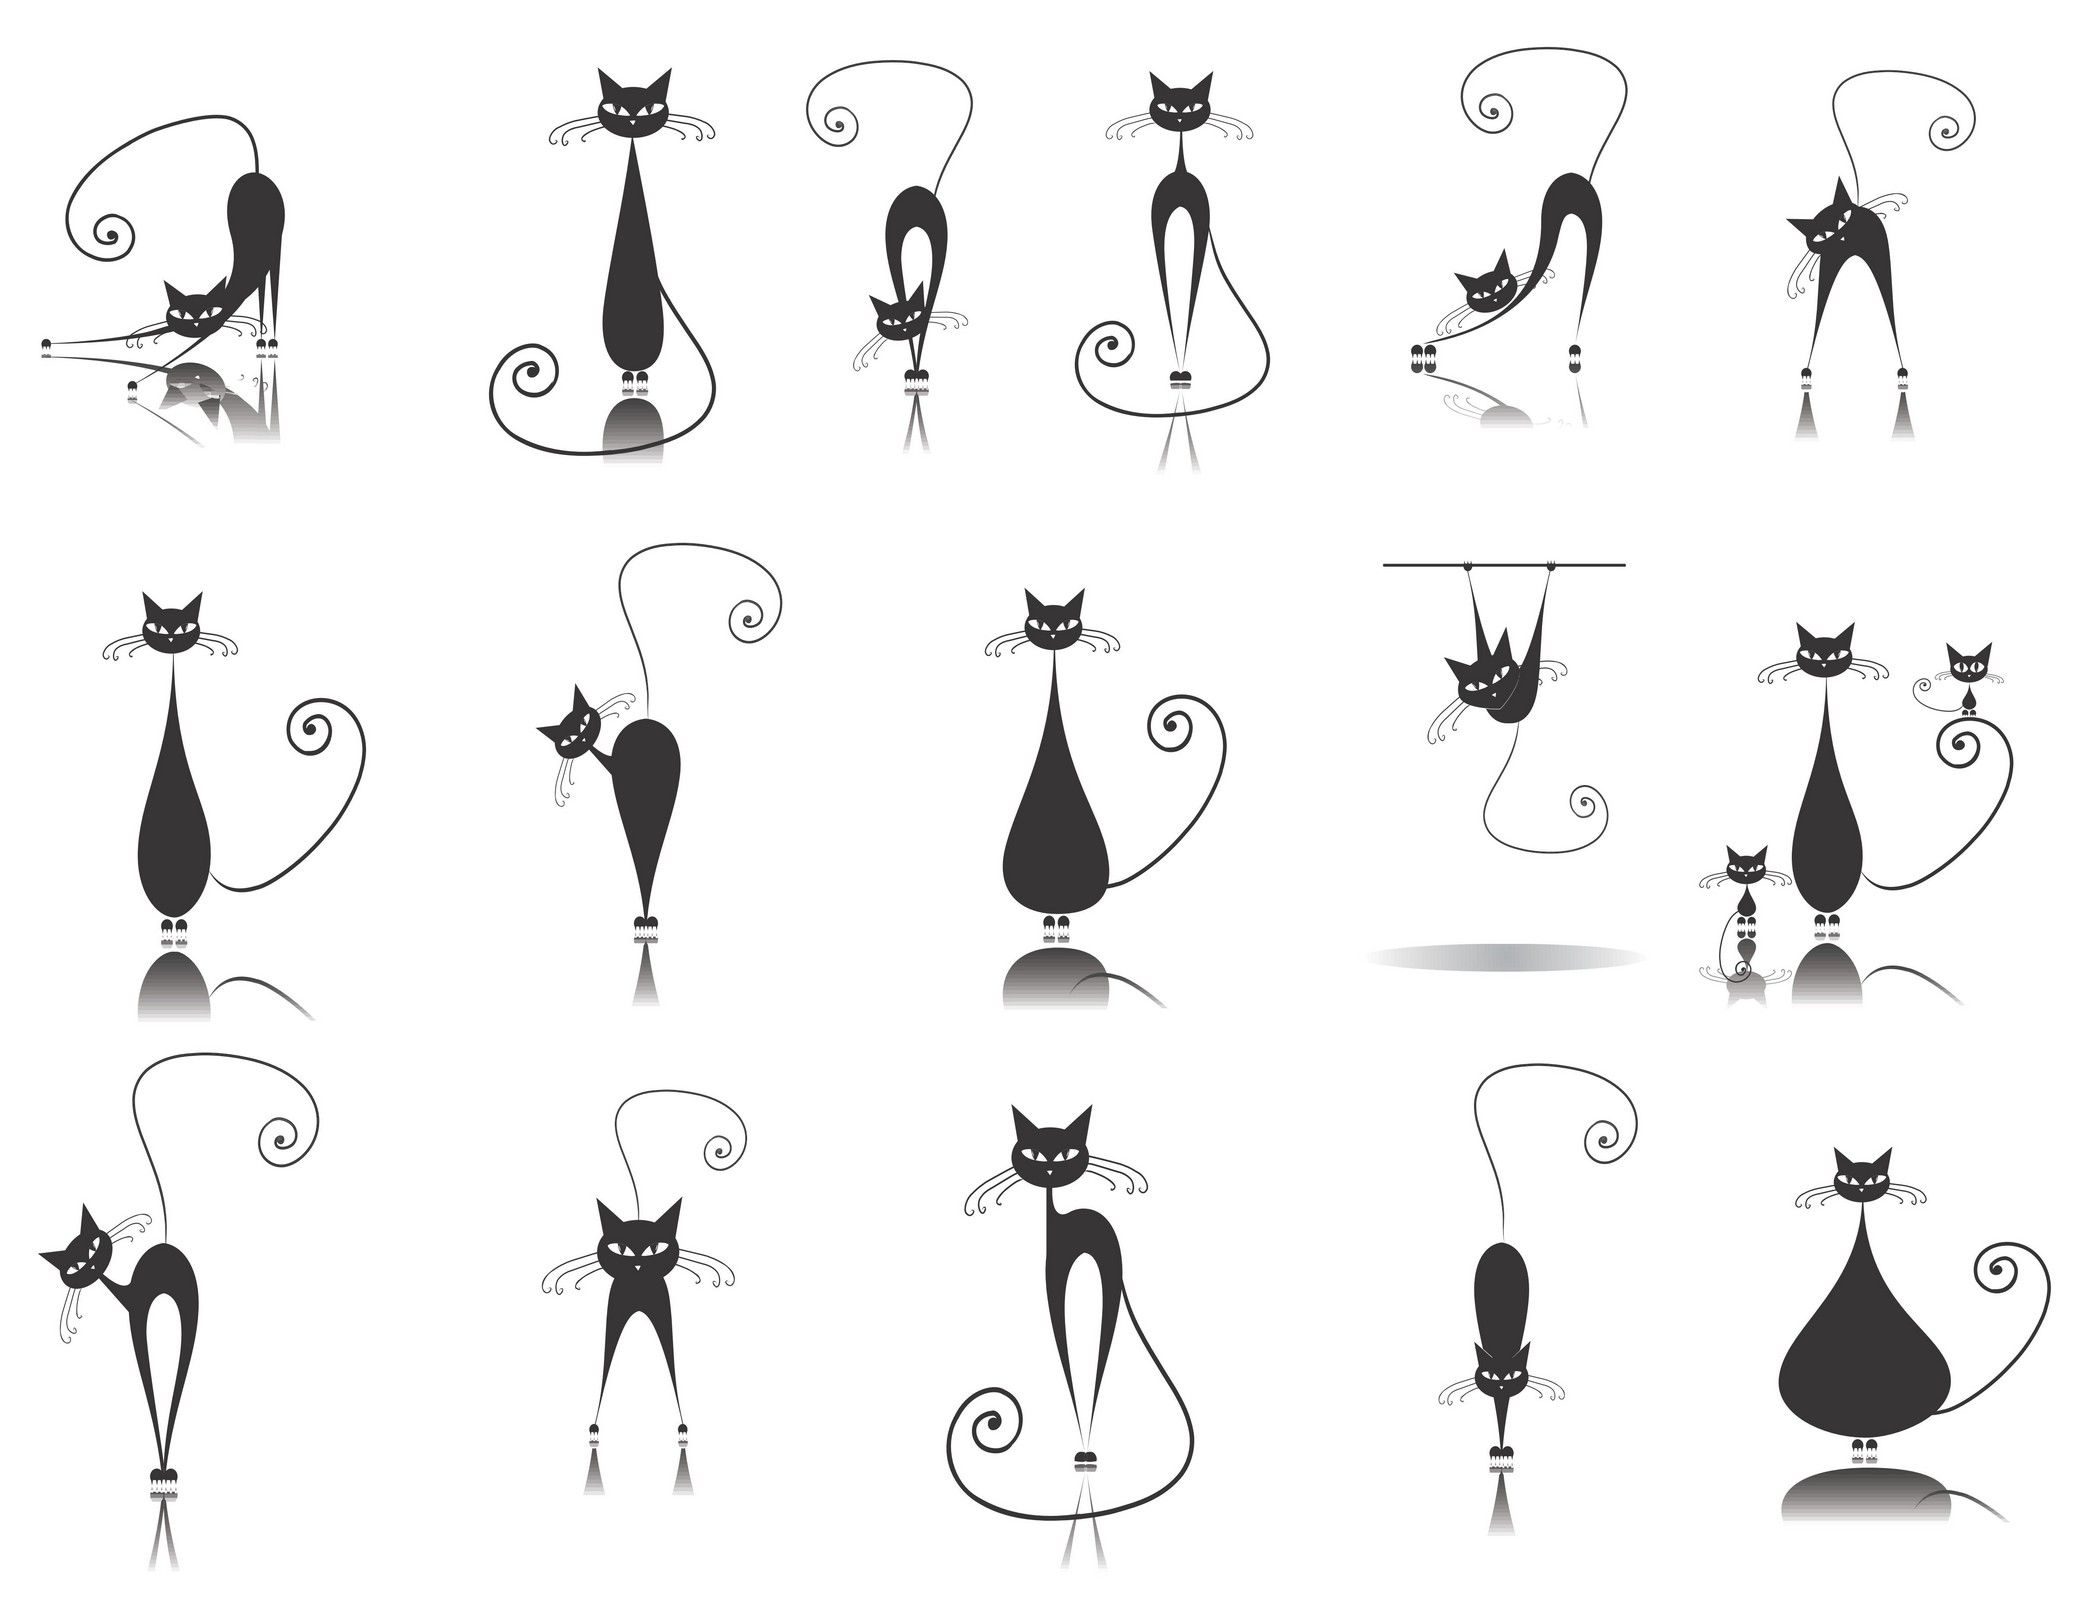 Cute cartoon animals [Cats] Vector EPS Free Download, Logo